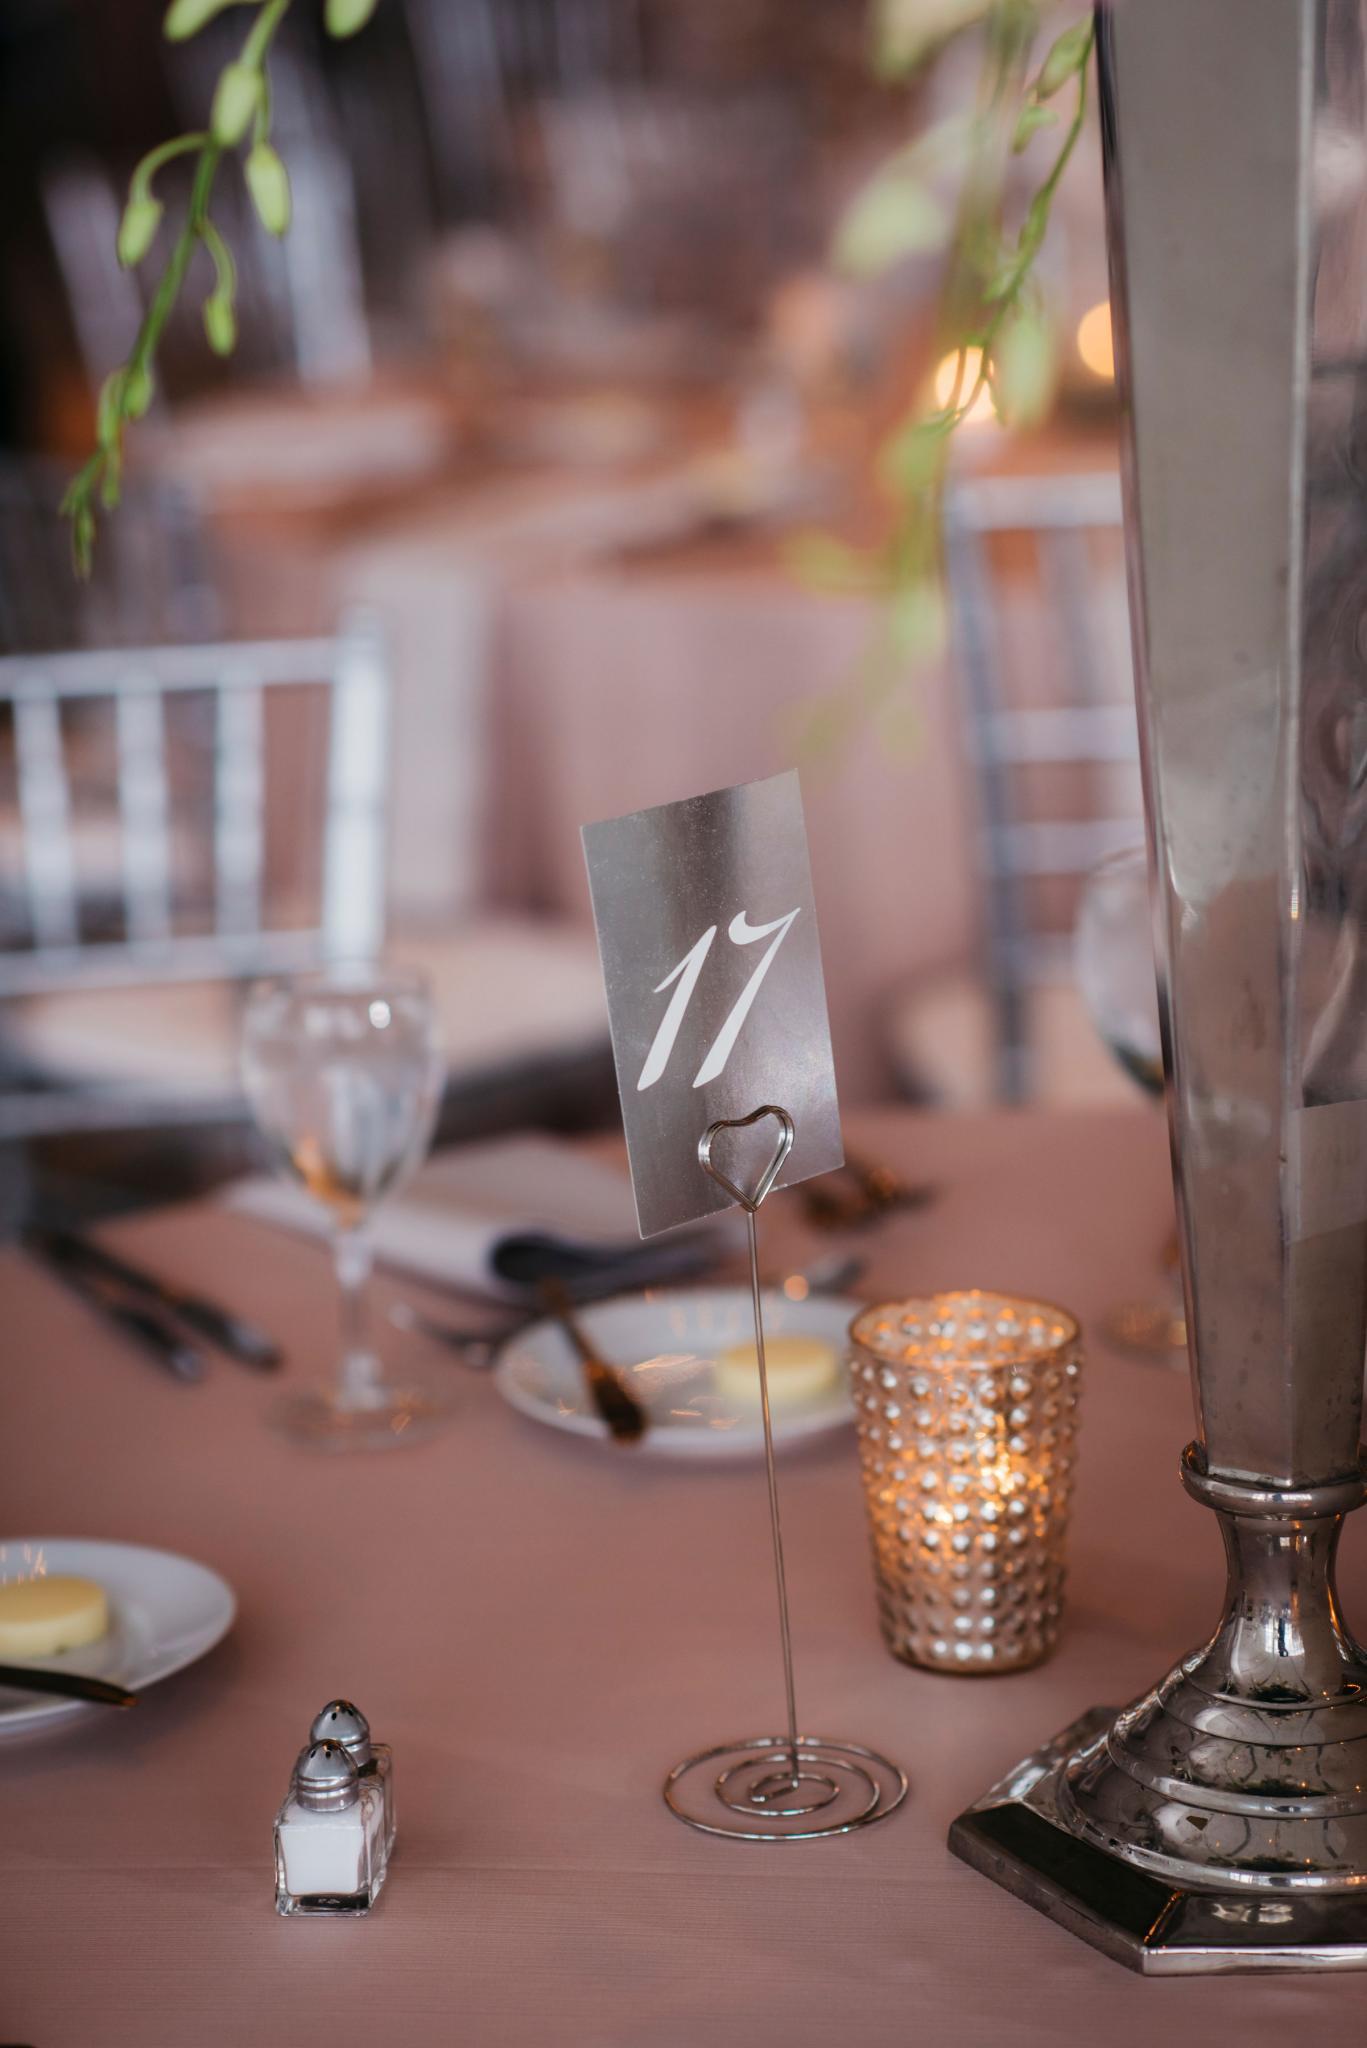 annie tommy venue SIX10 chicago, il wedding reception details